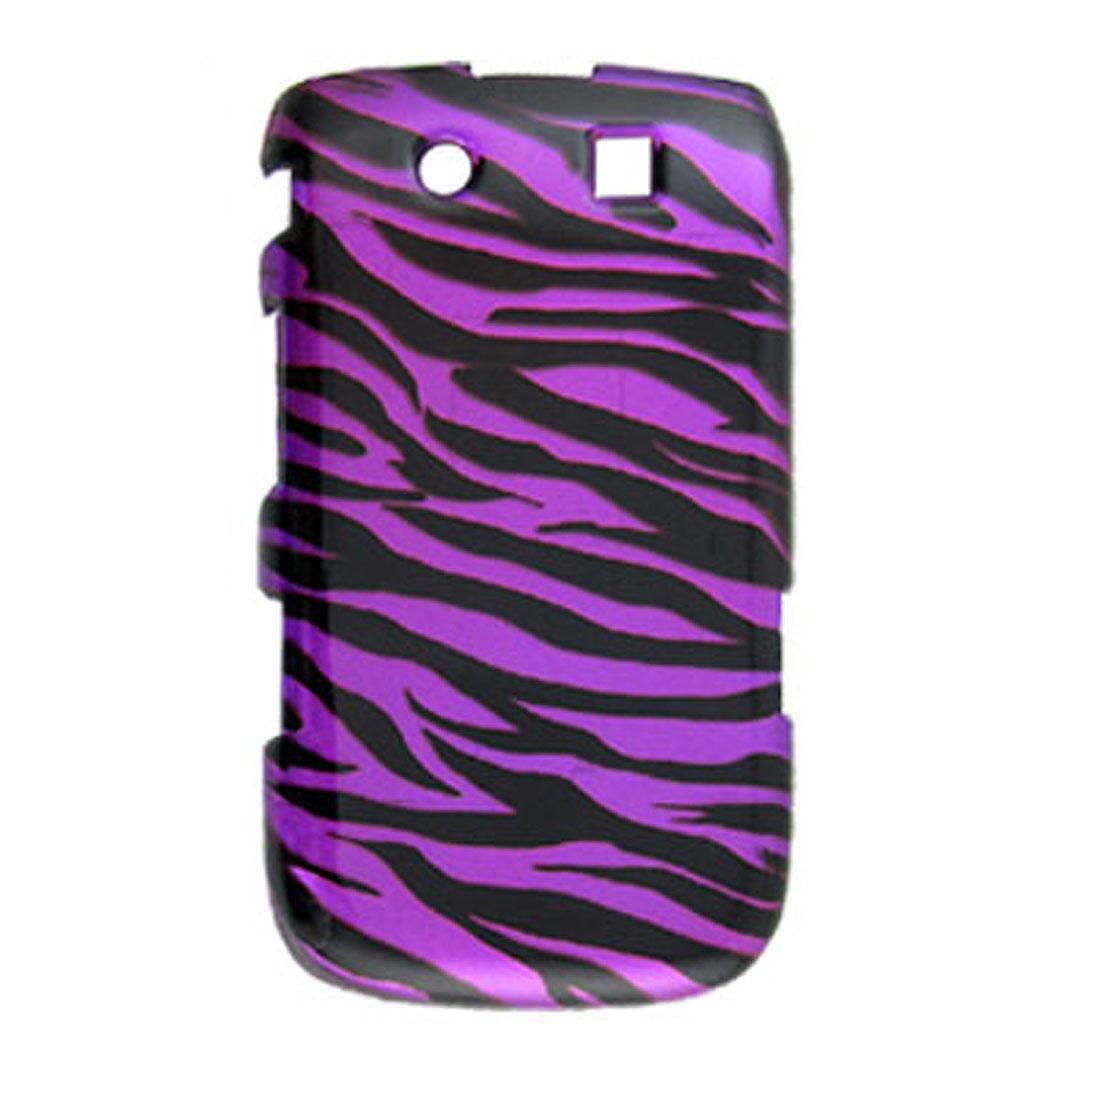 Purple Background Black Zebra Print Case for Blackberry Torch 9800